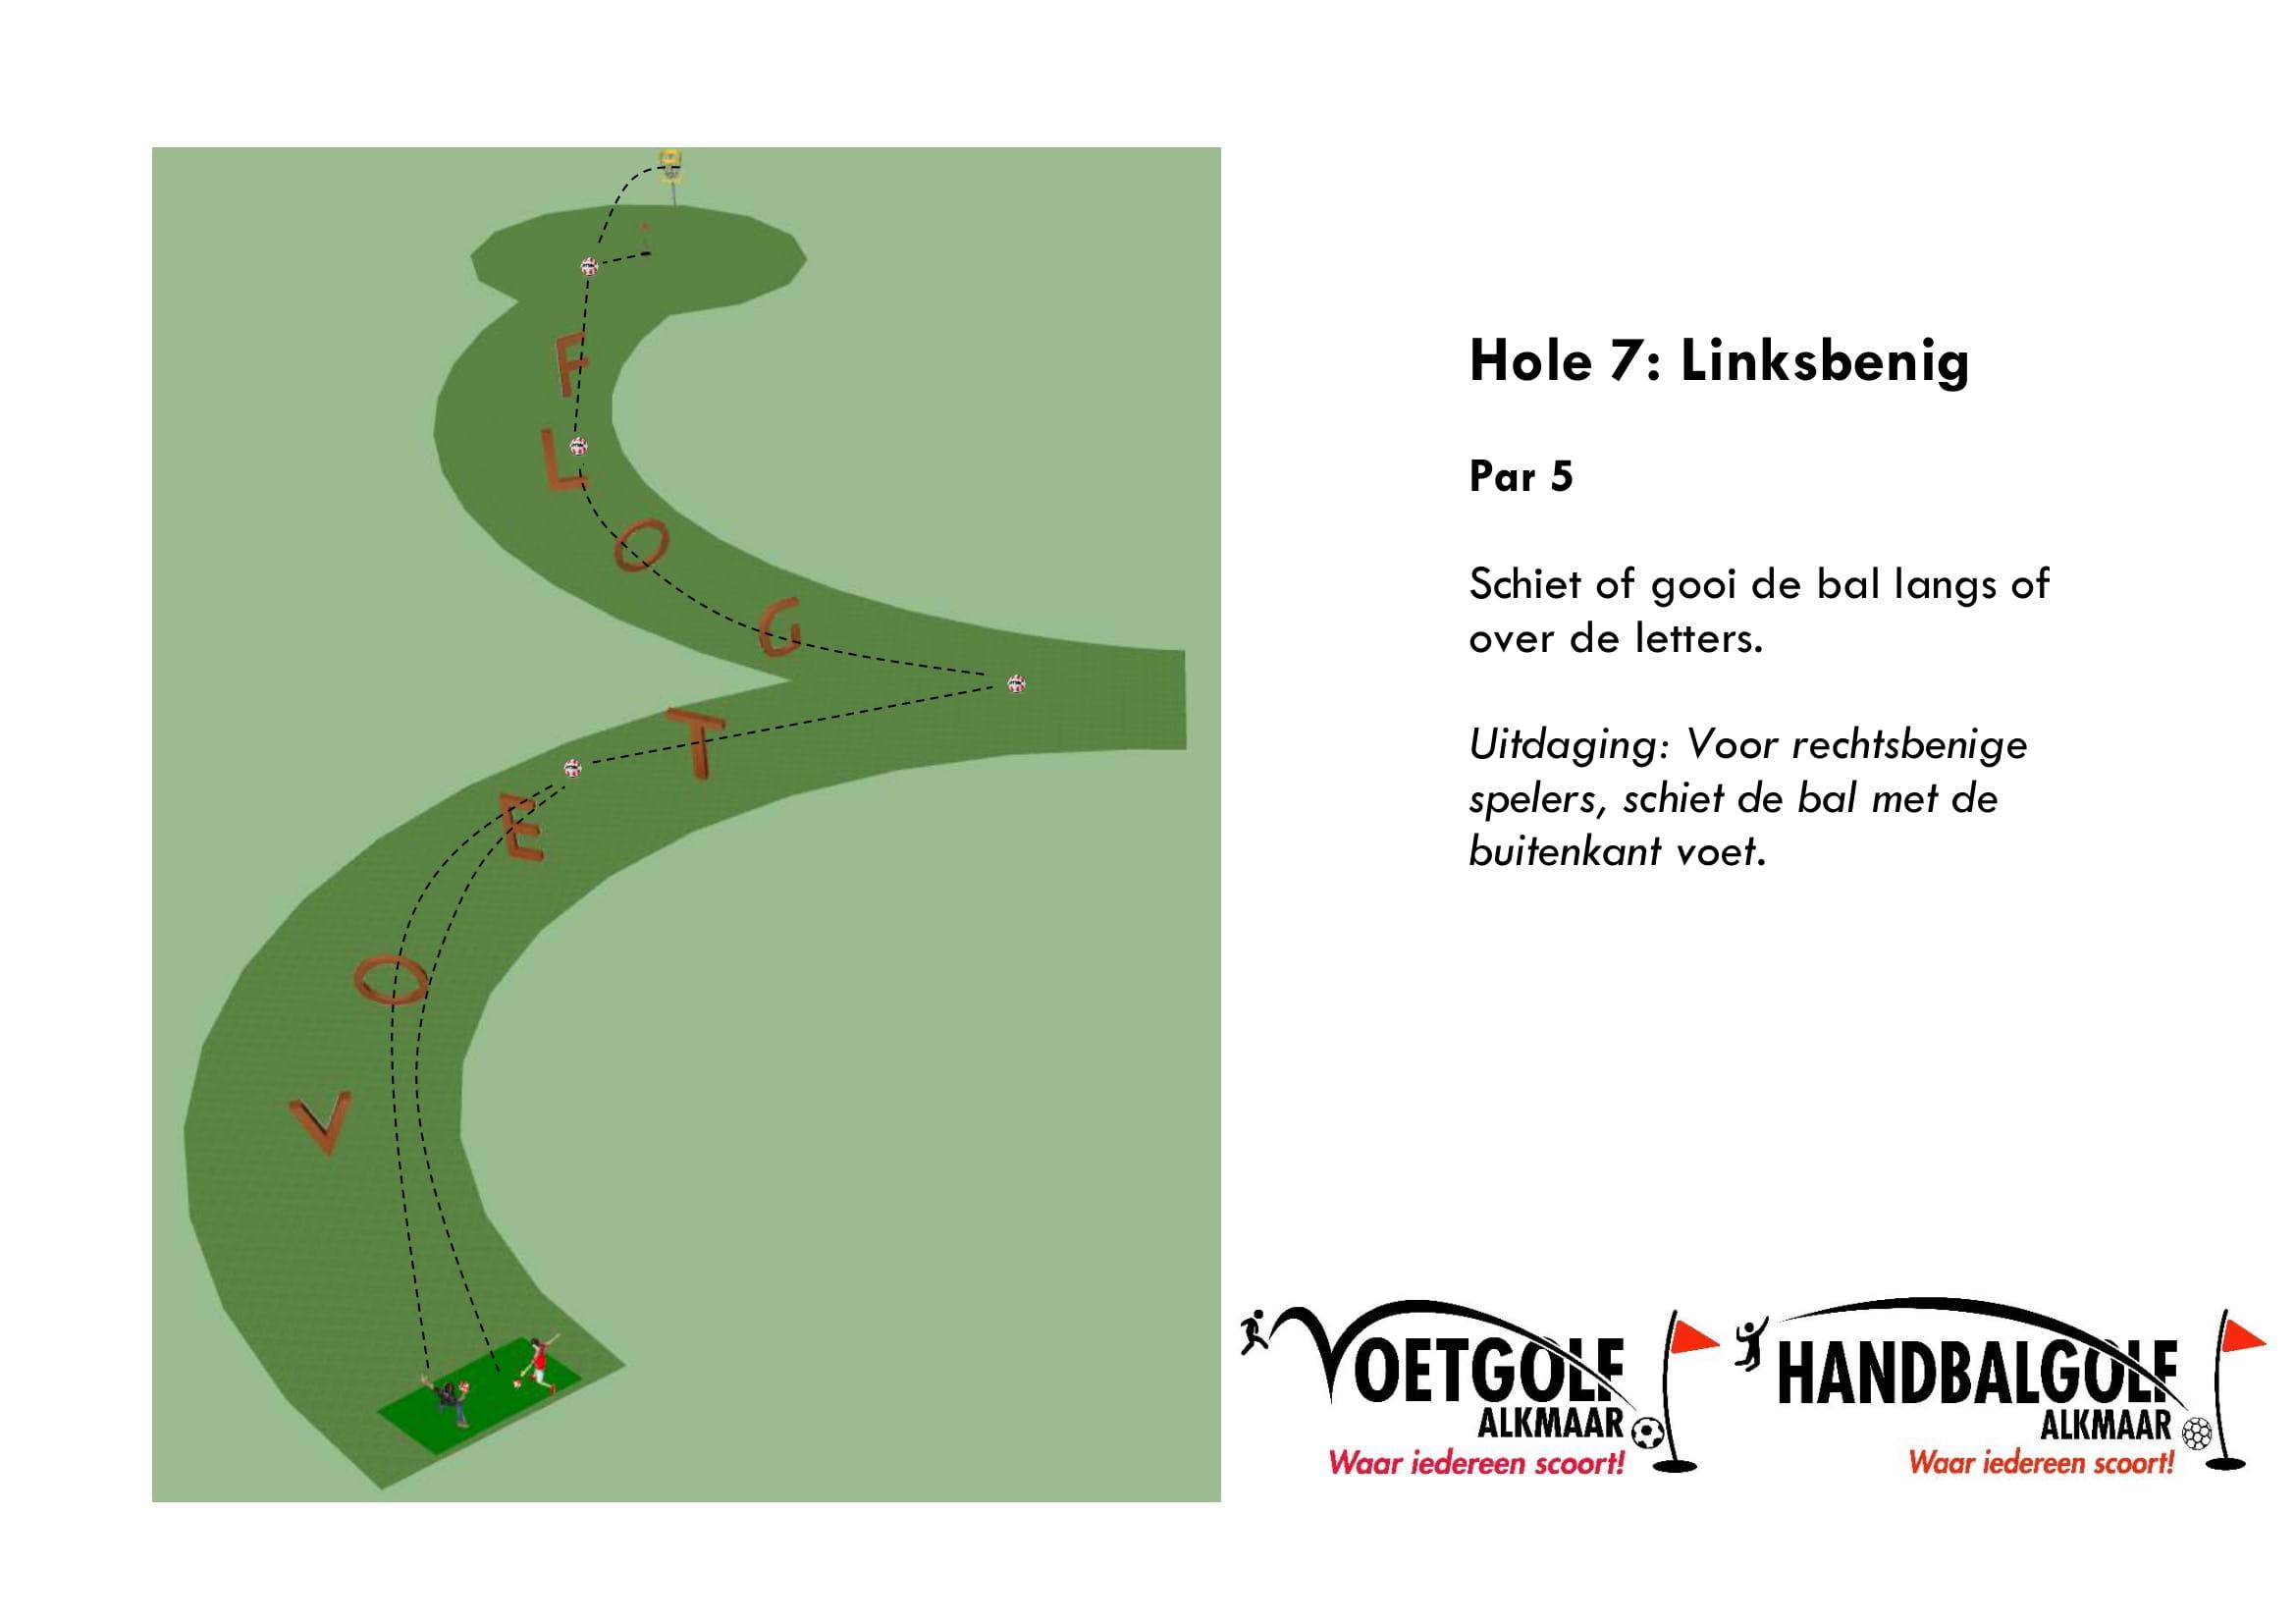 hole 7 met handbal